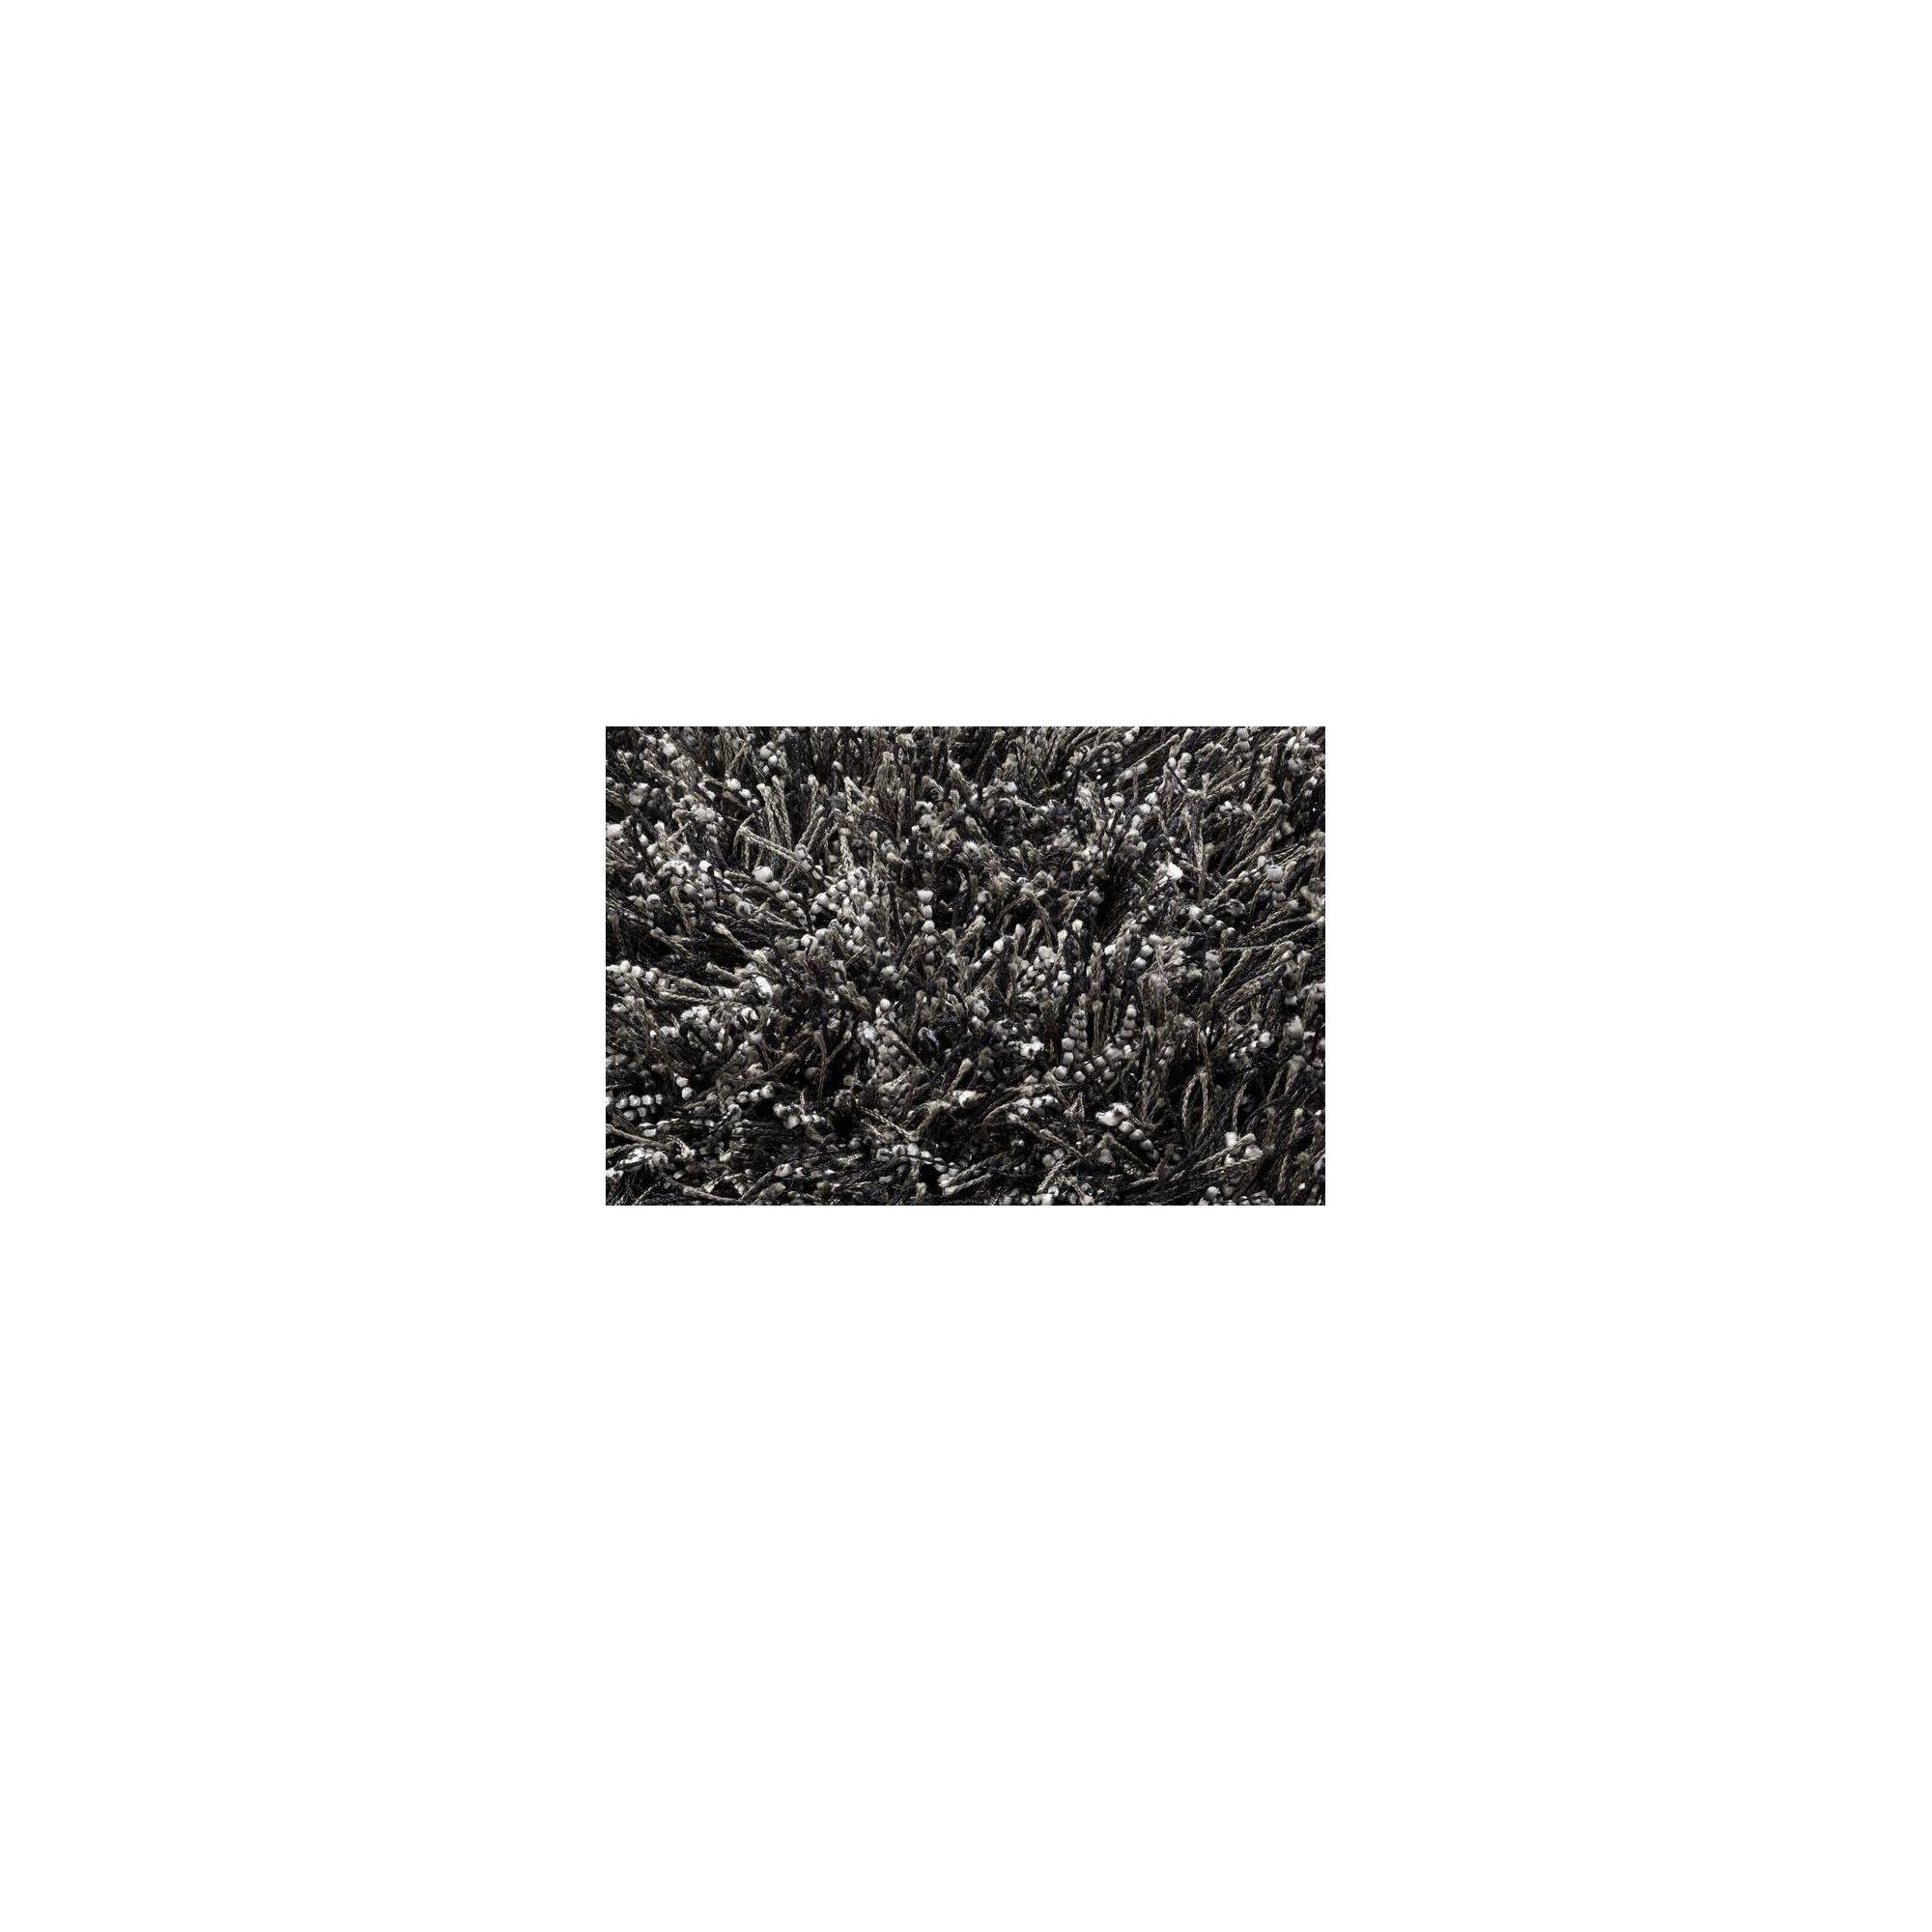 Linie Design Sprinkle Black Shag Rug - 200cm x 140cm at Tescos Direct